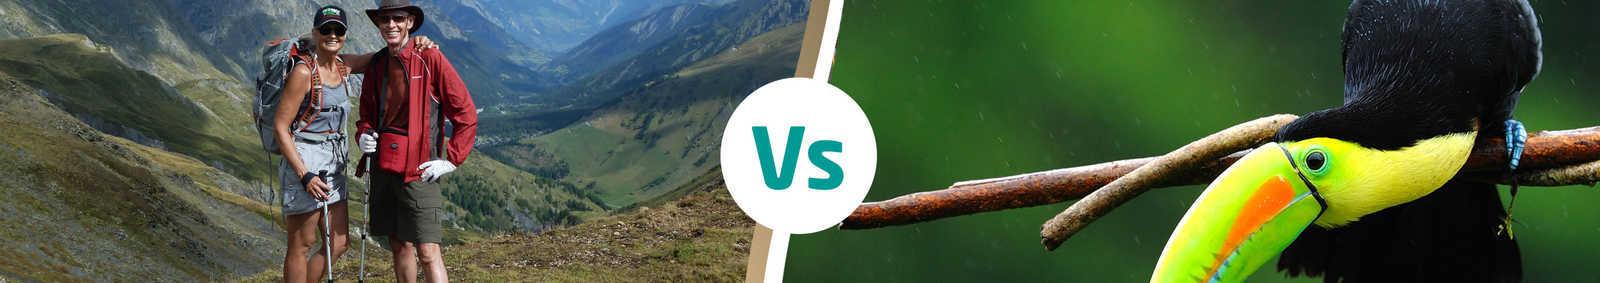 costa rica versus switzerland banner